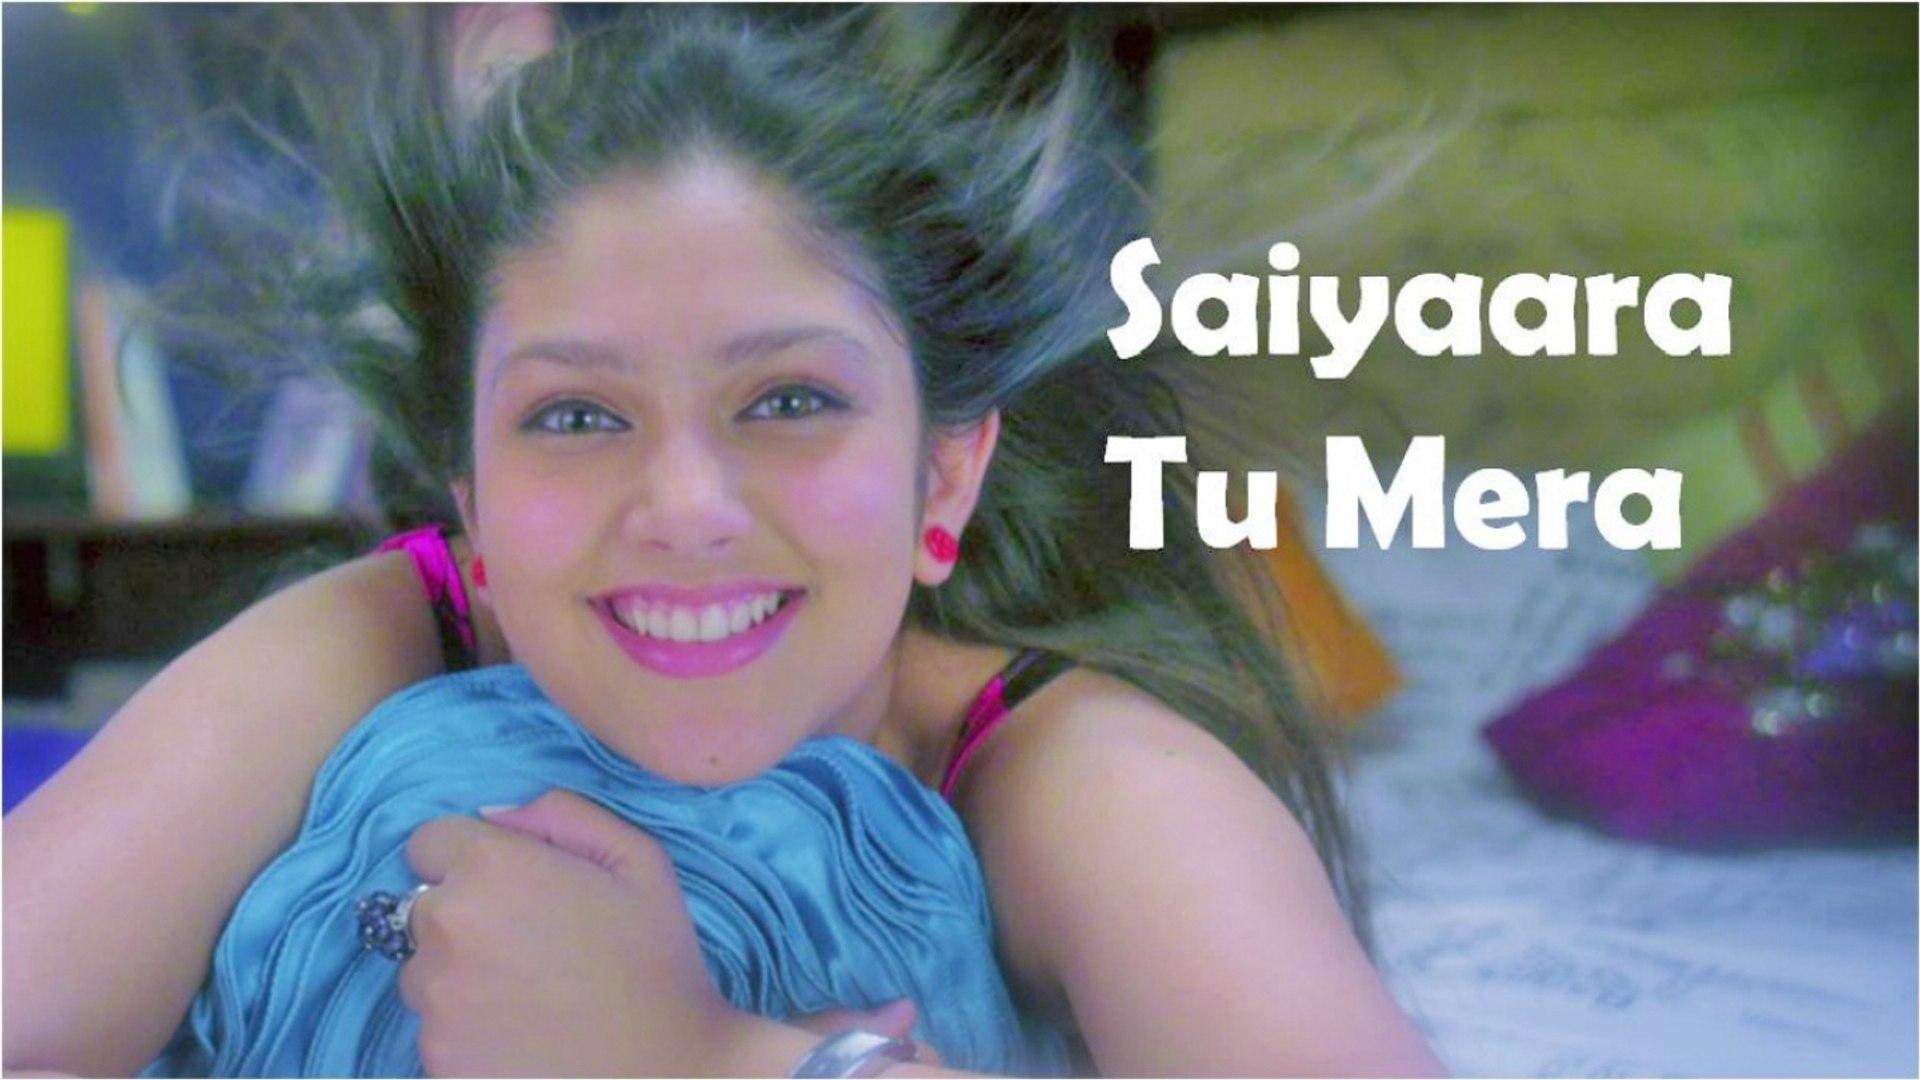 Budhaditya Mukherjee, Annie Chawla - Saiyaara Tu Mera | Love In Malaysia | Latest Love song 2018